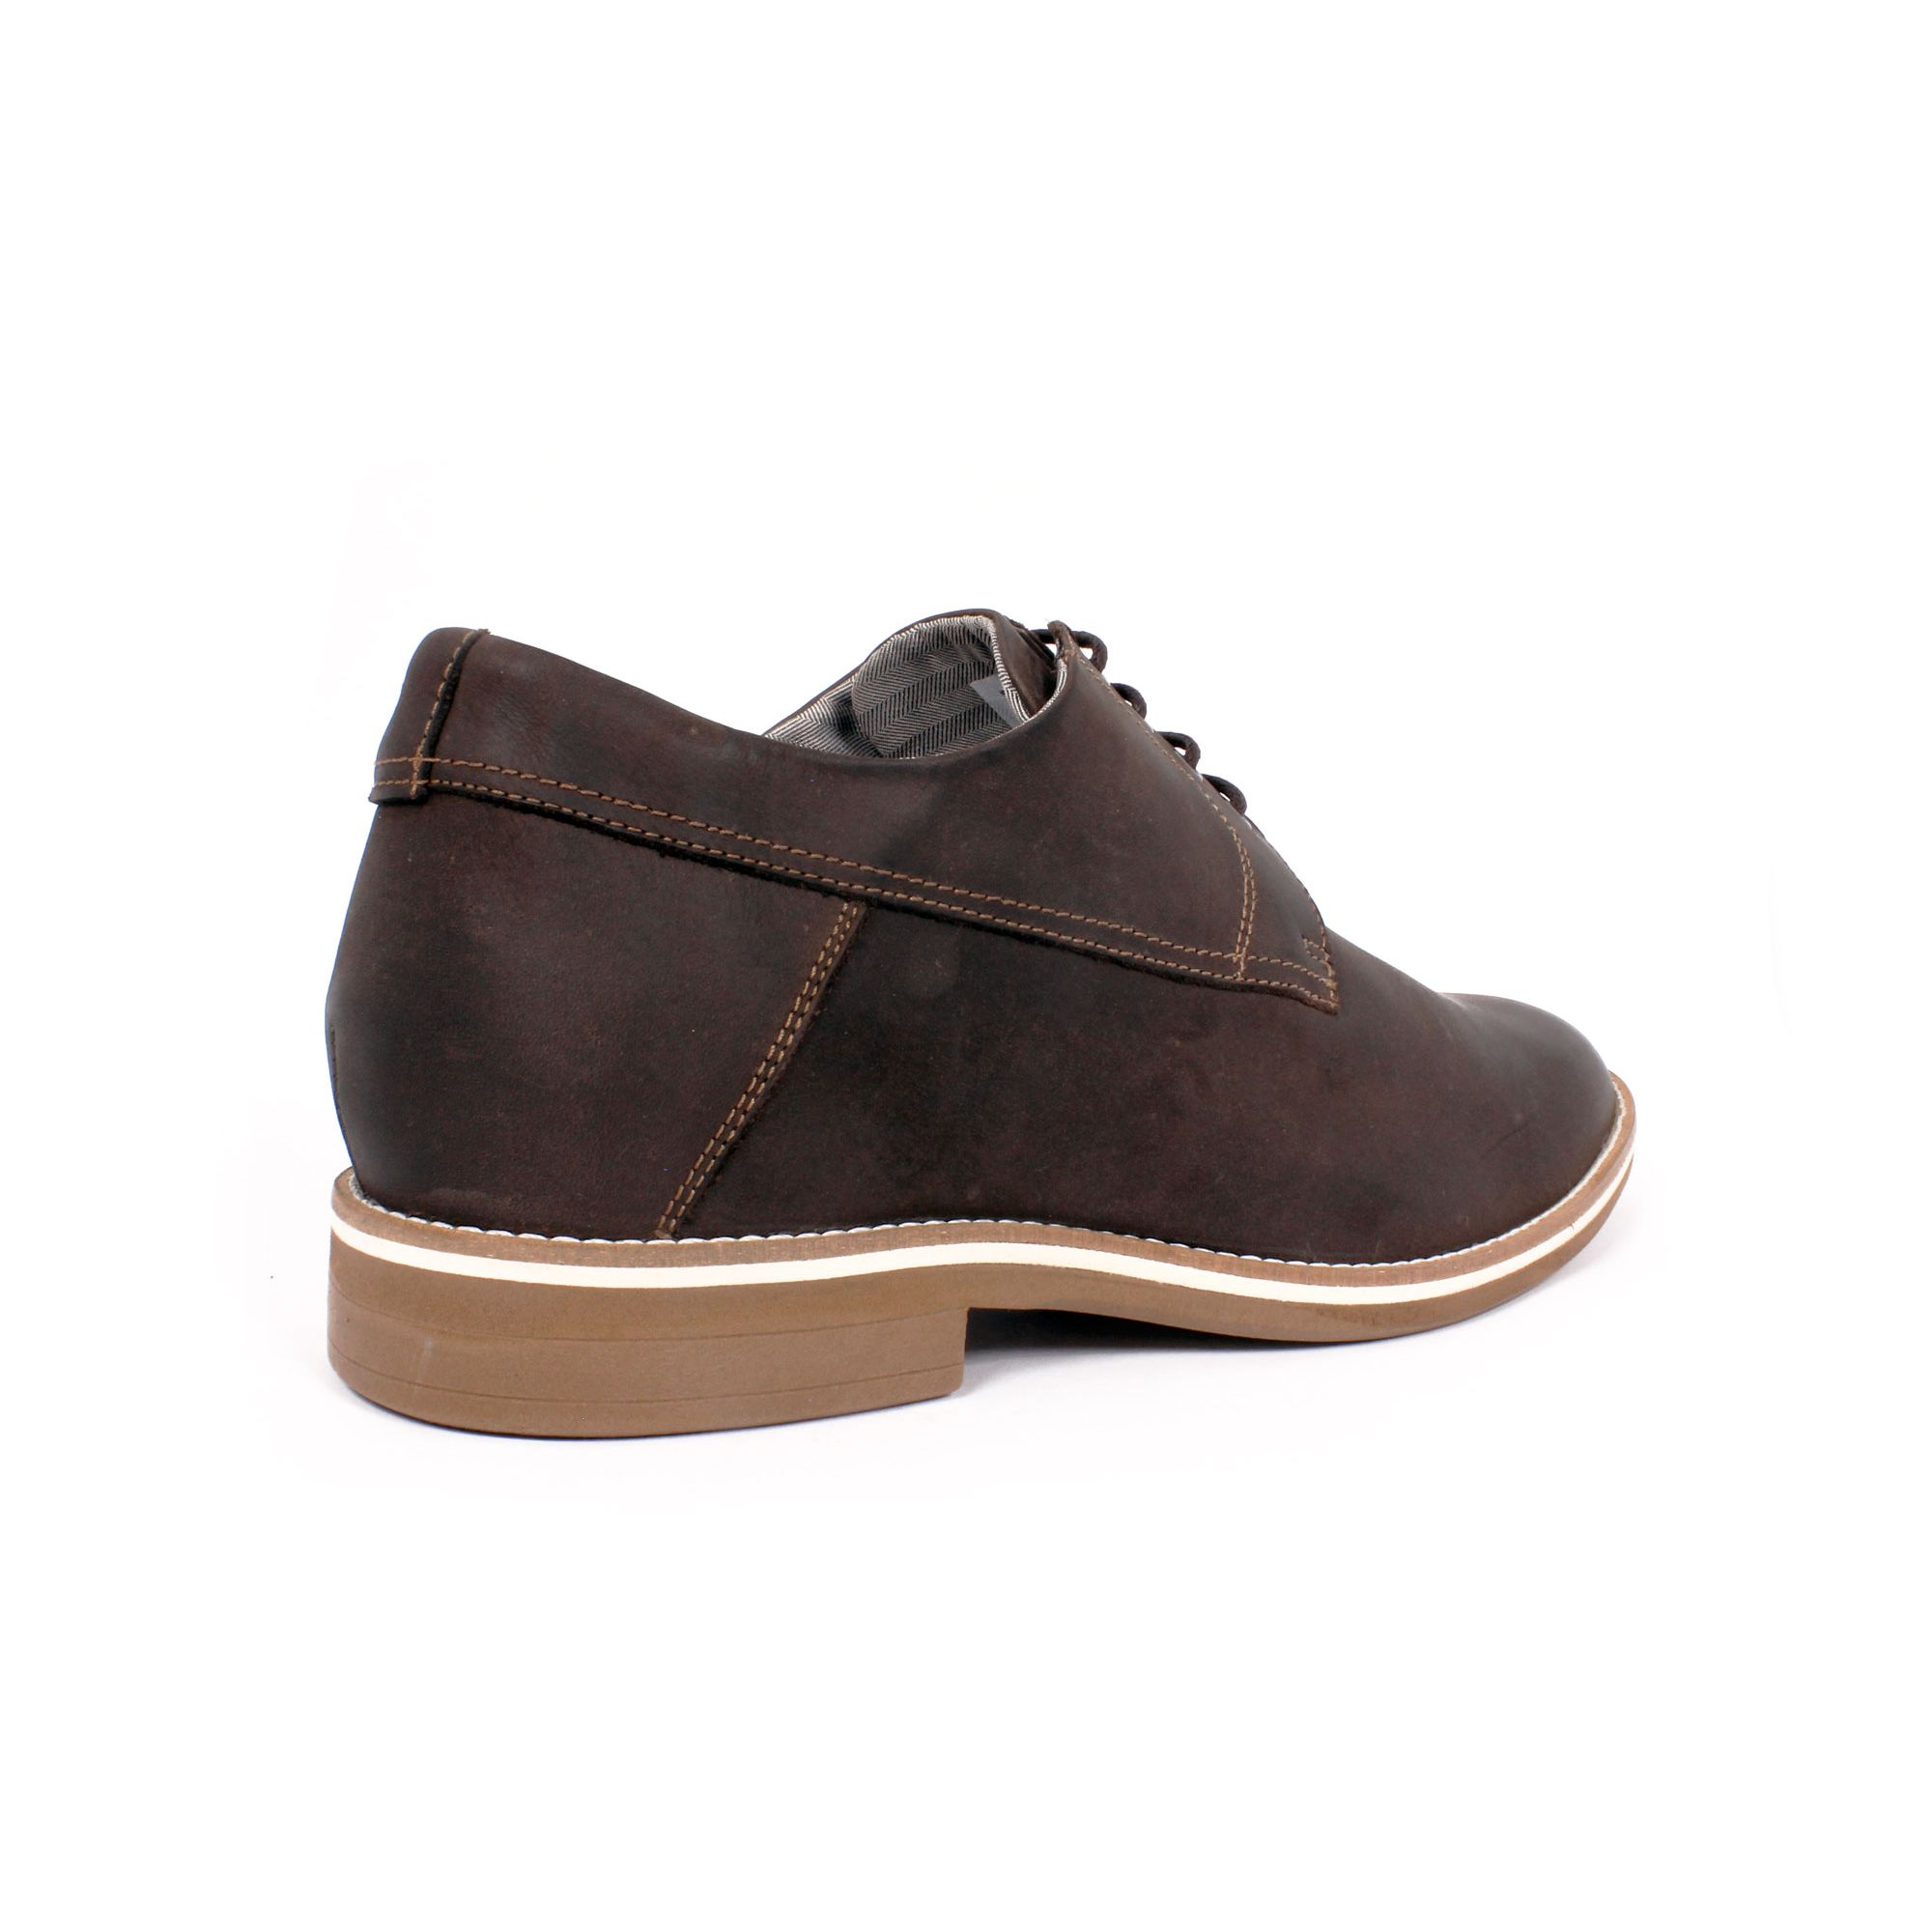 Zapato Casual Culture Café Max Denegri +7cm de Altura_70866